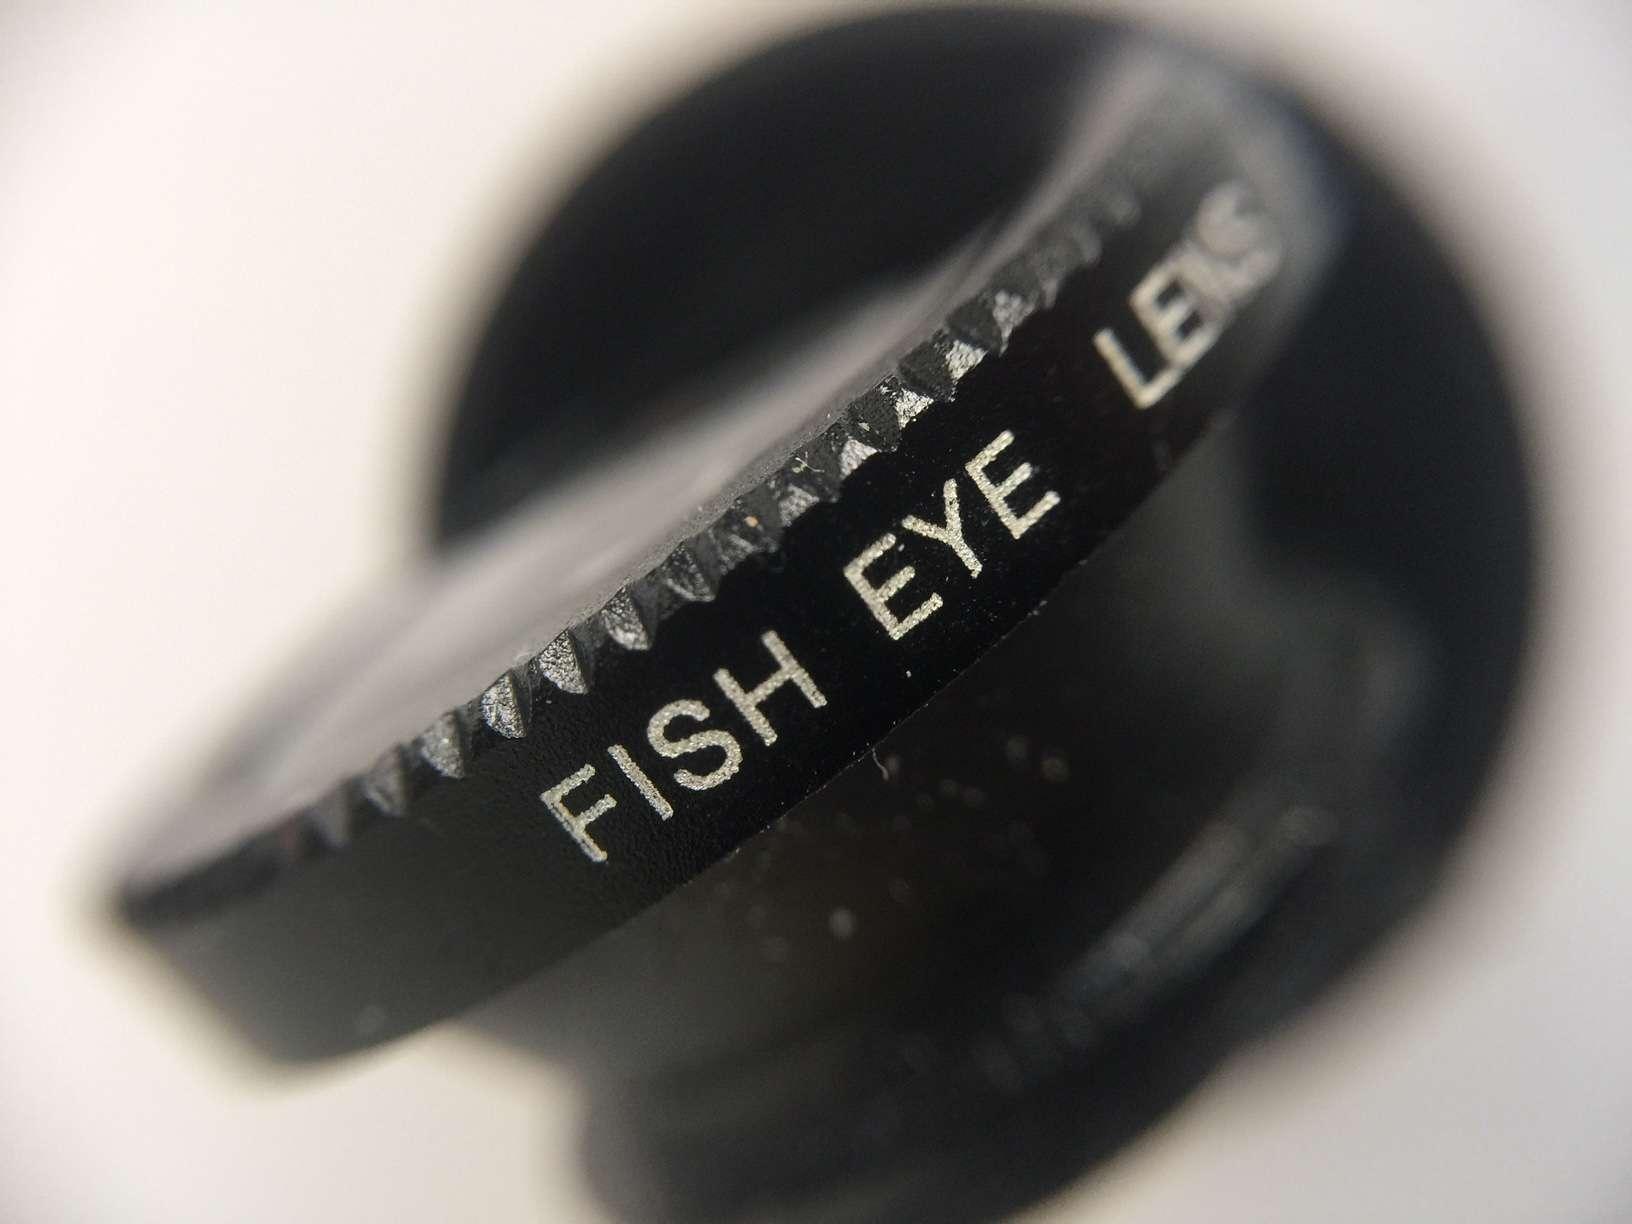 Fish Eye lens taken using a clip-on macro lens on an iPhone 6 Plus (7dayshop.com)